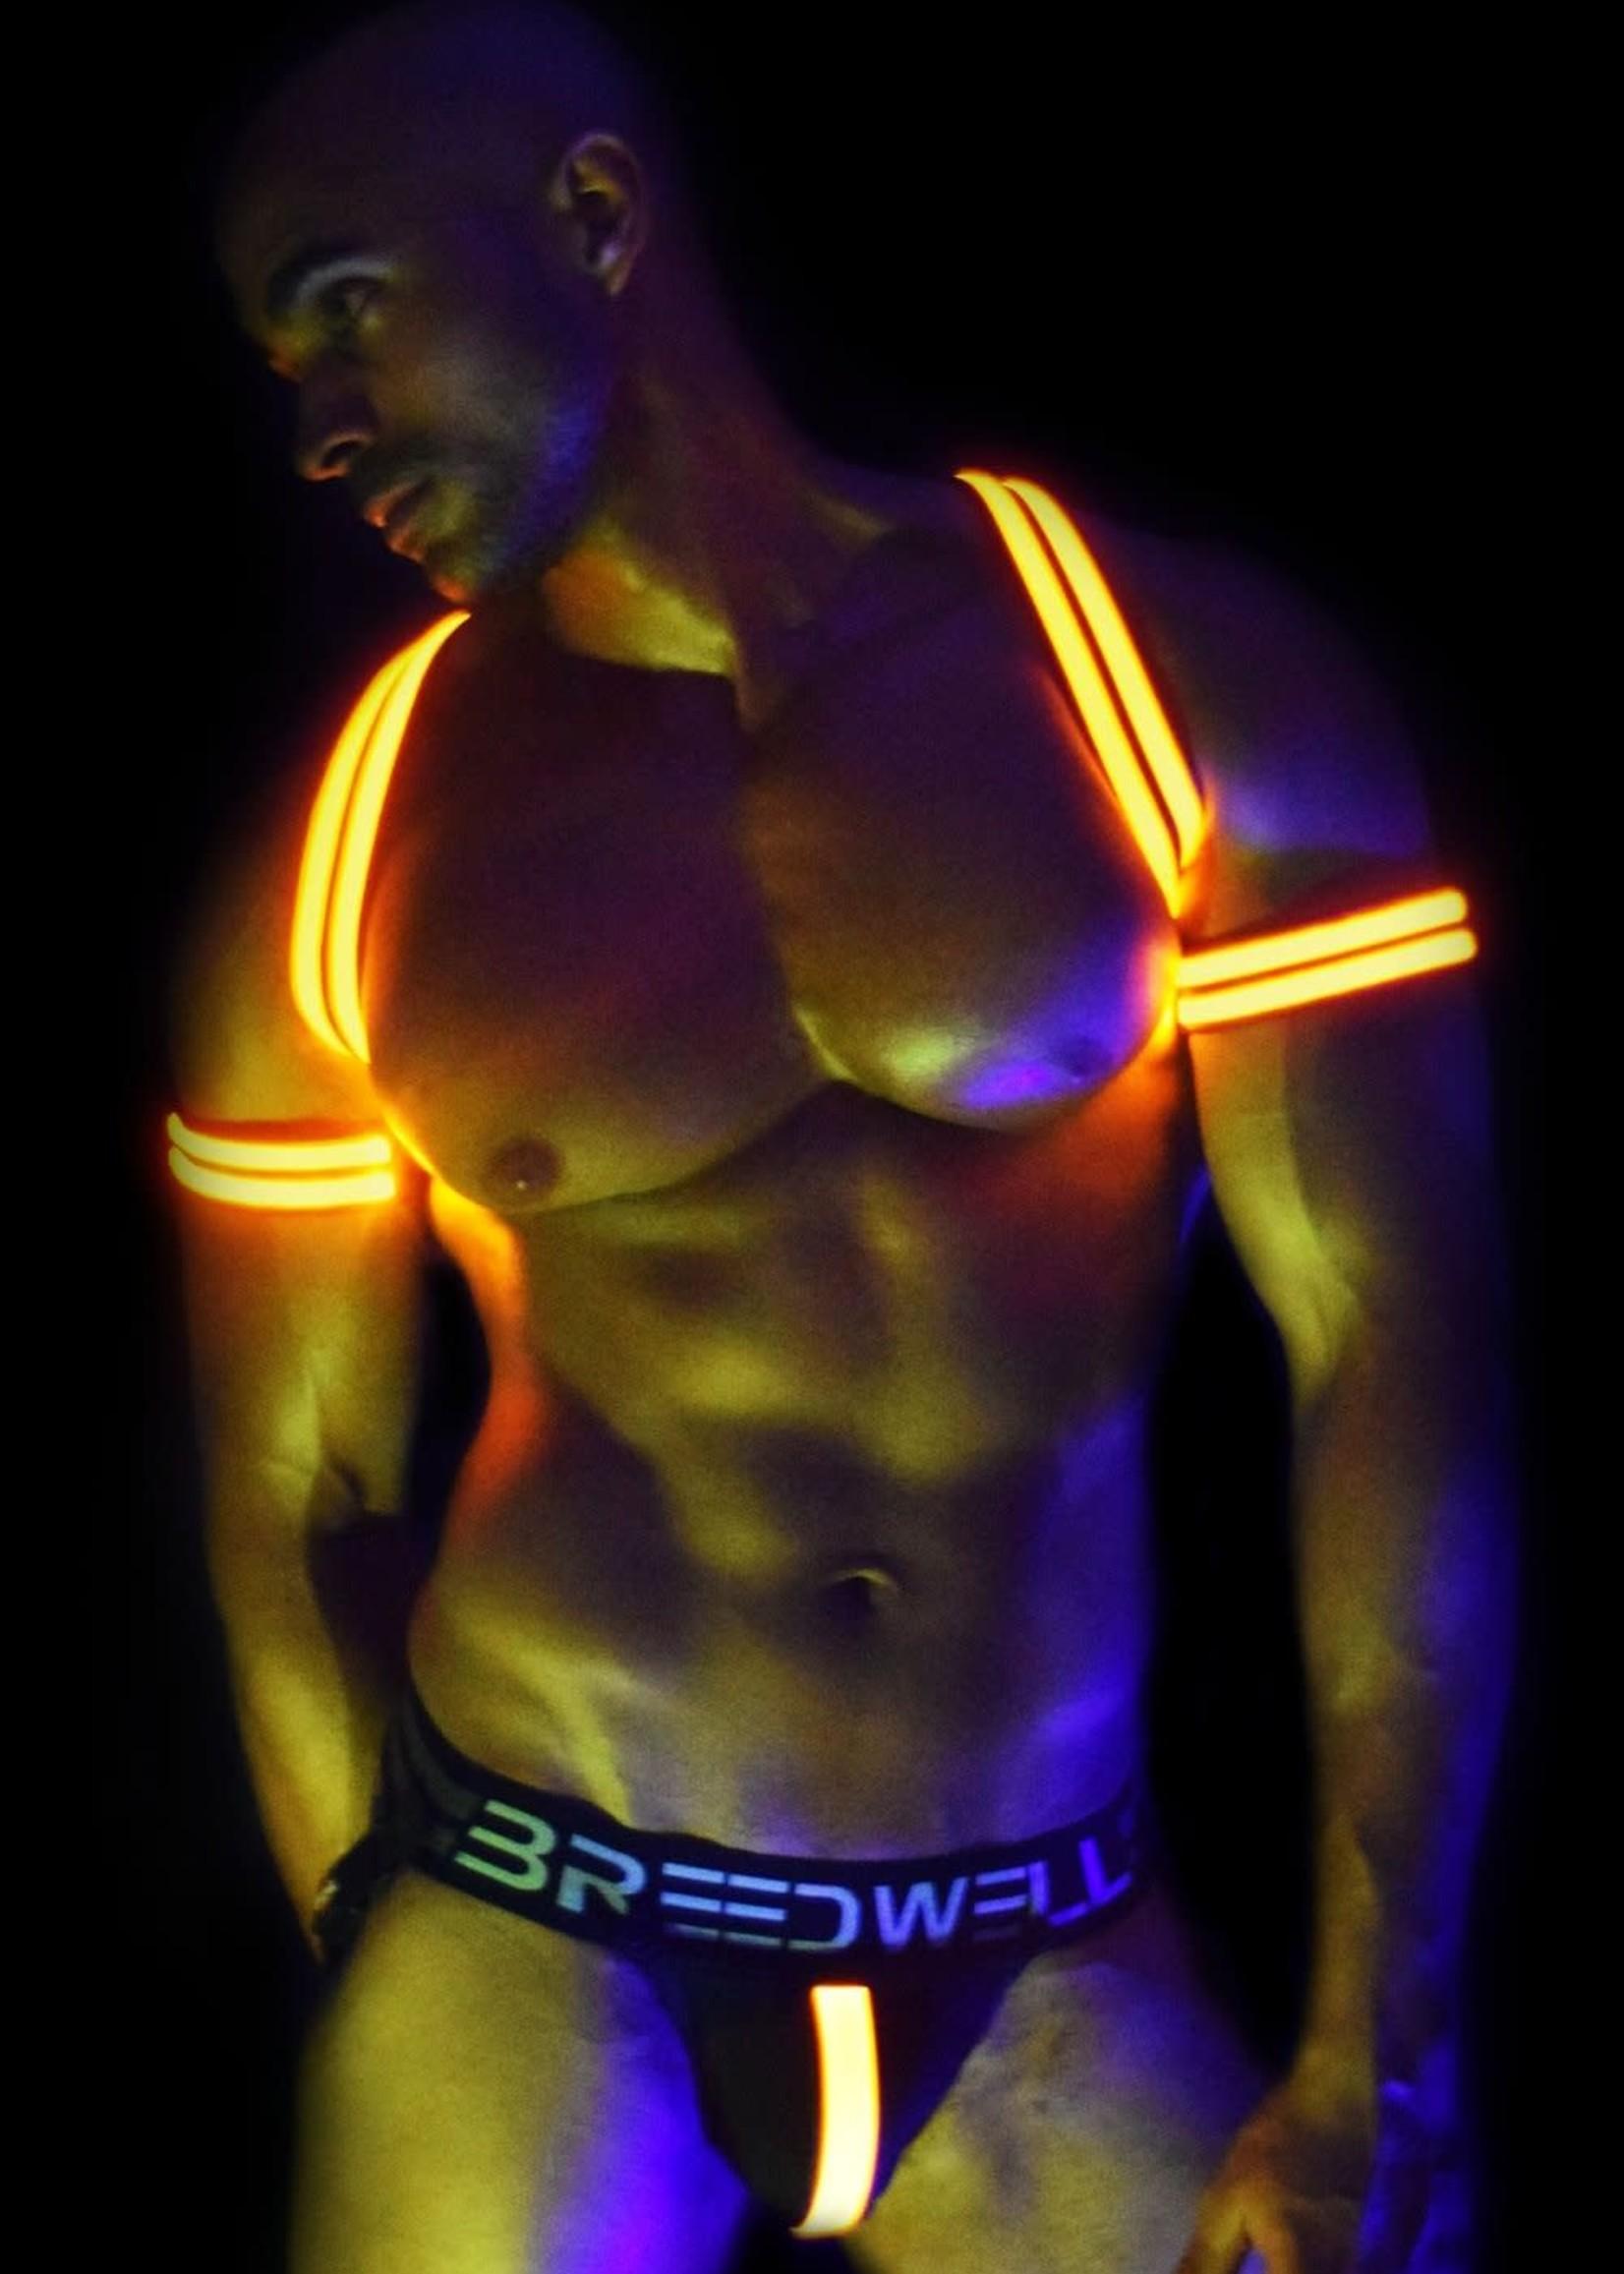 Breedwell Breedwell Glow Armband